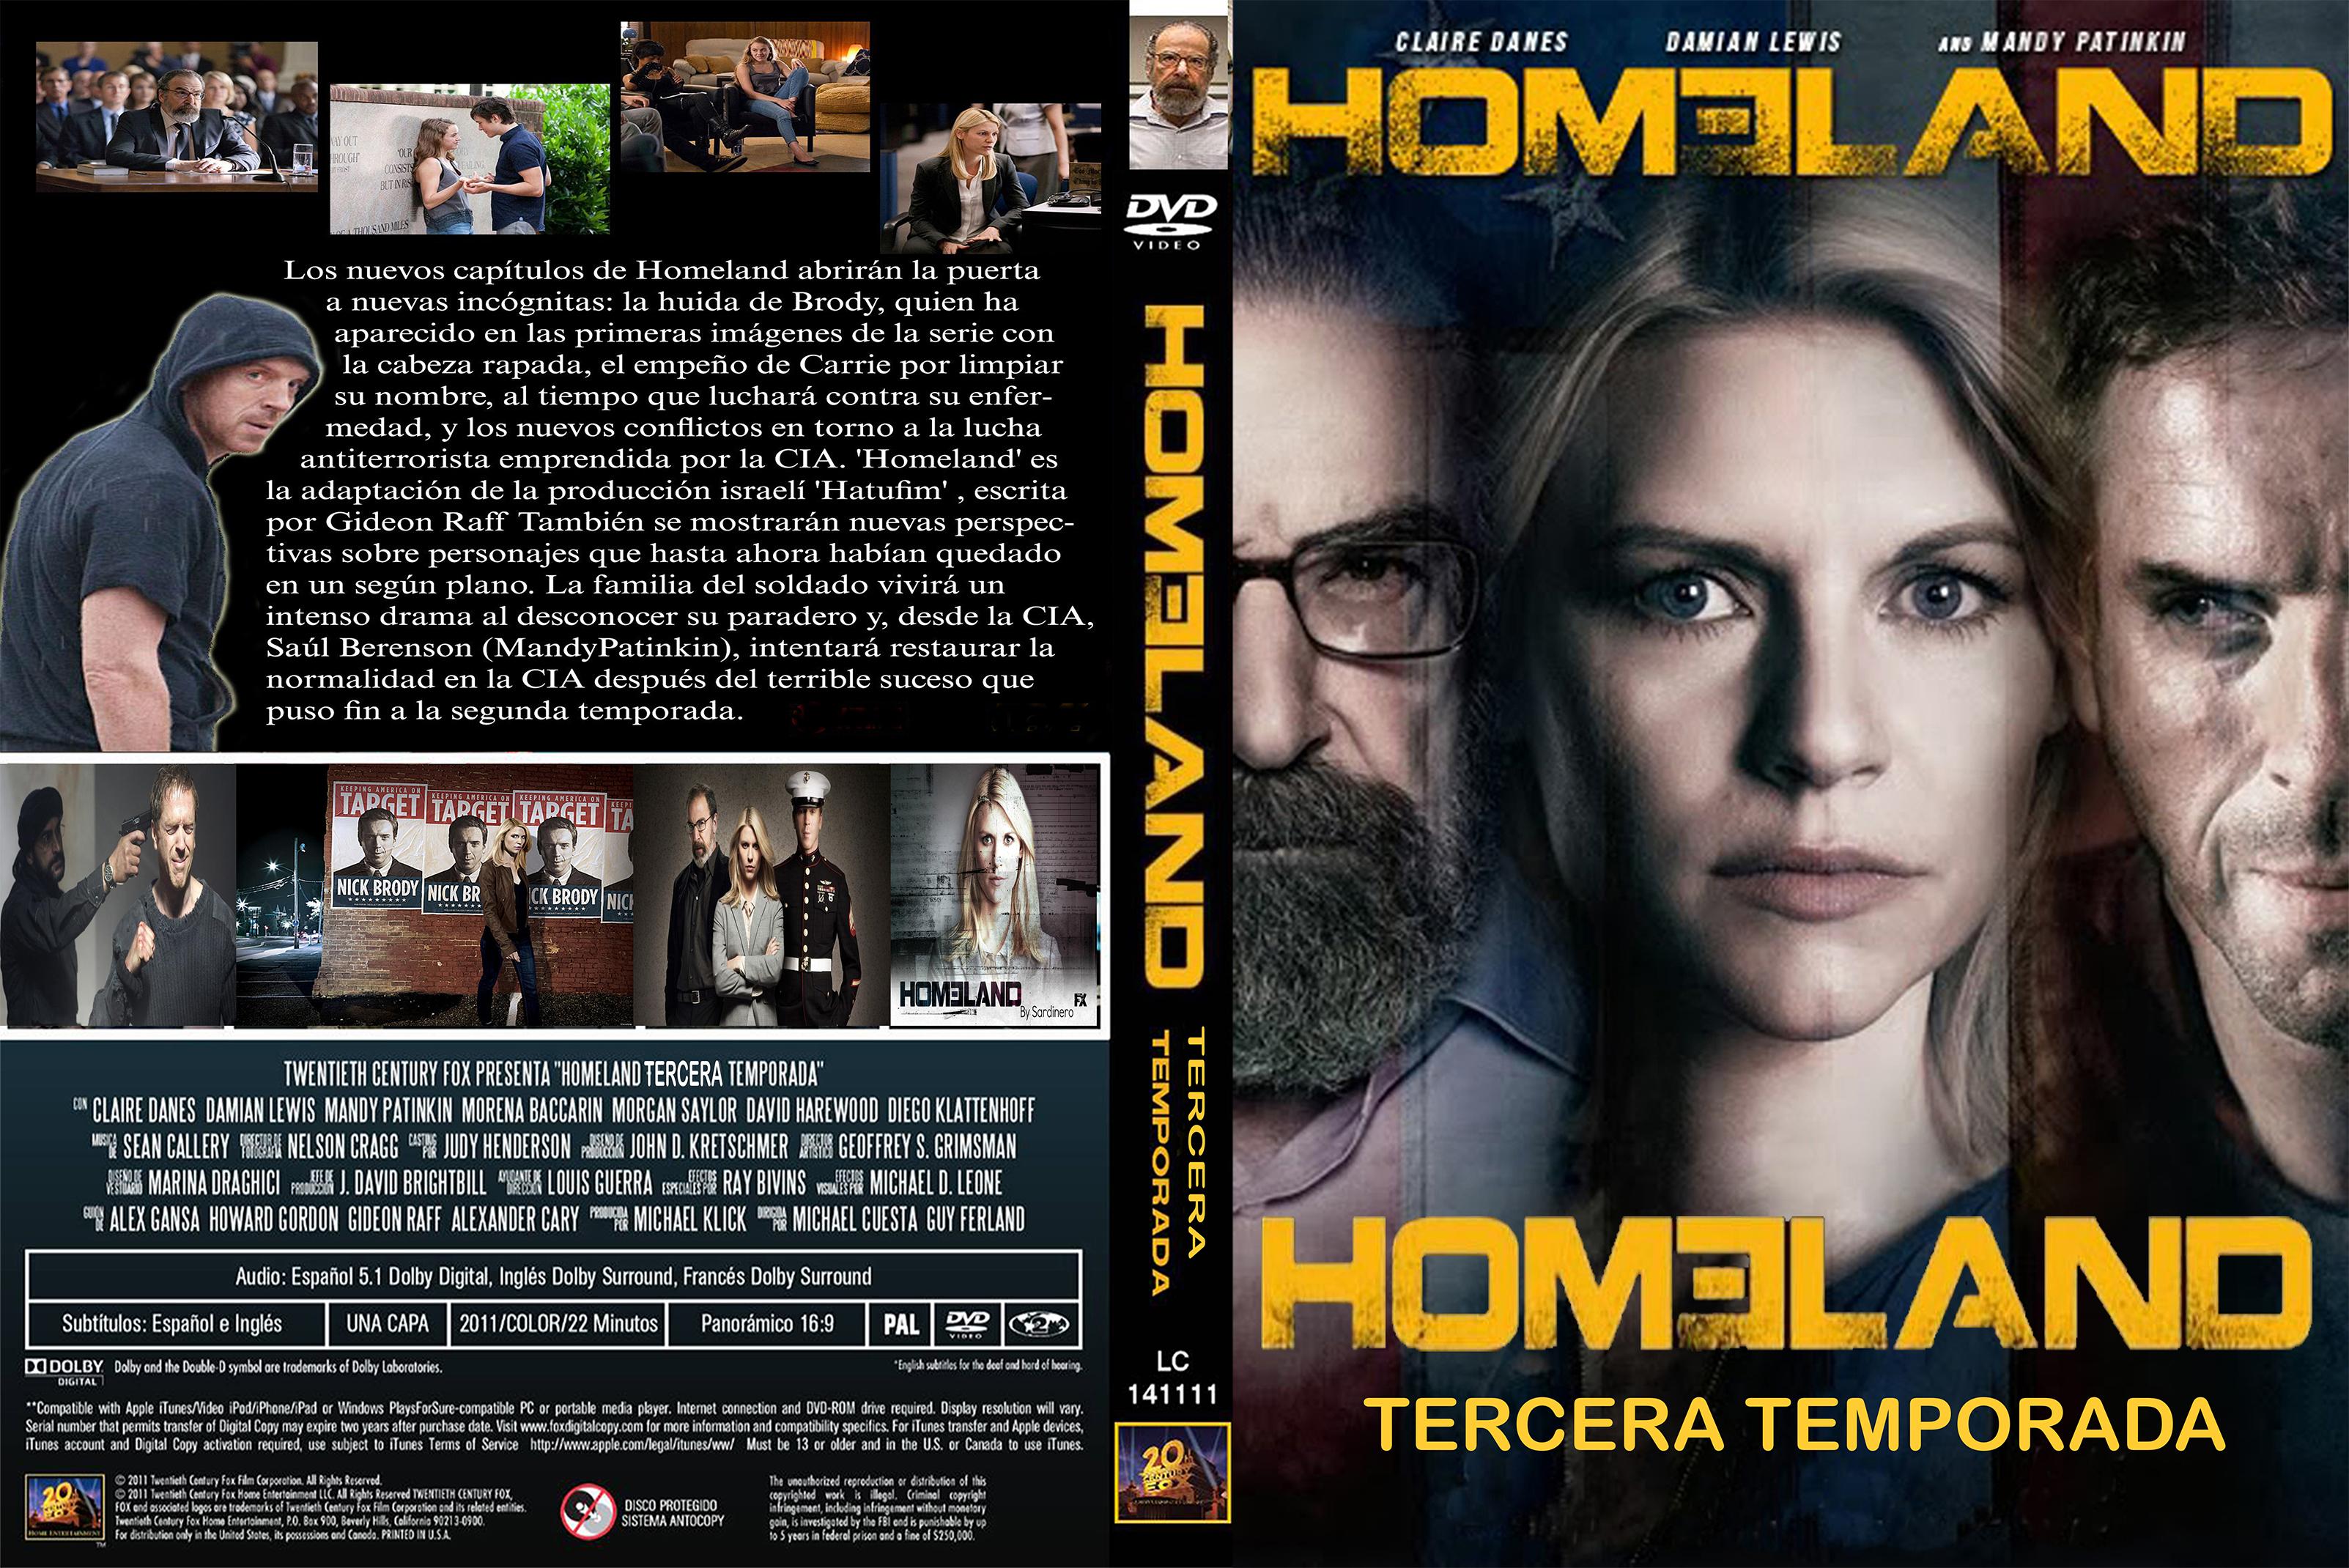 Homeland season 5 release date in Melbourne